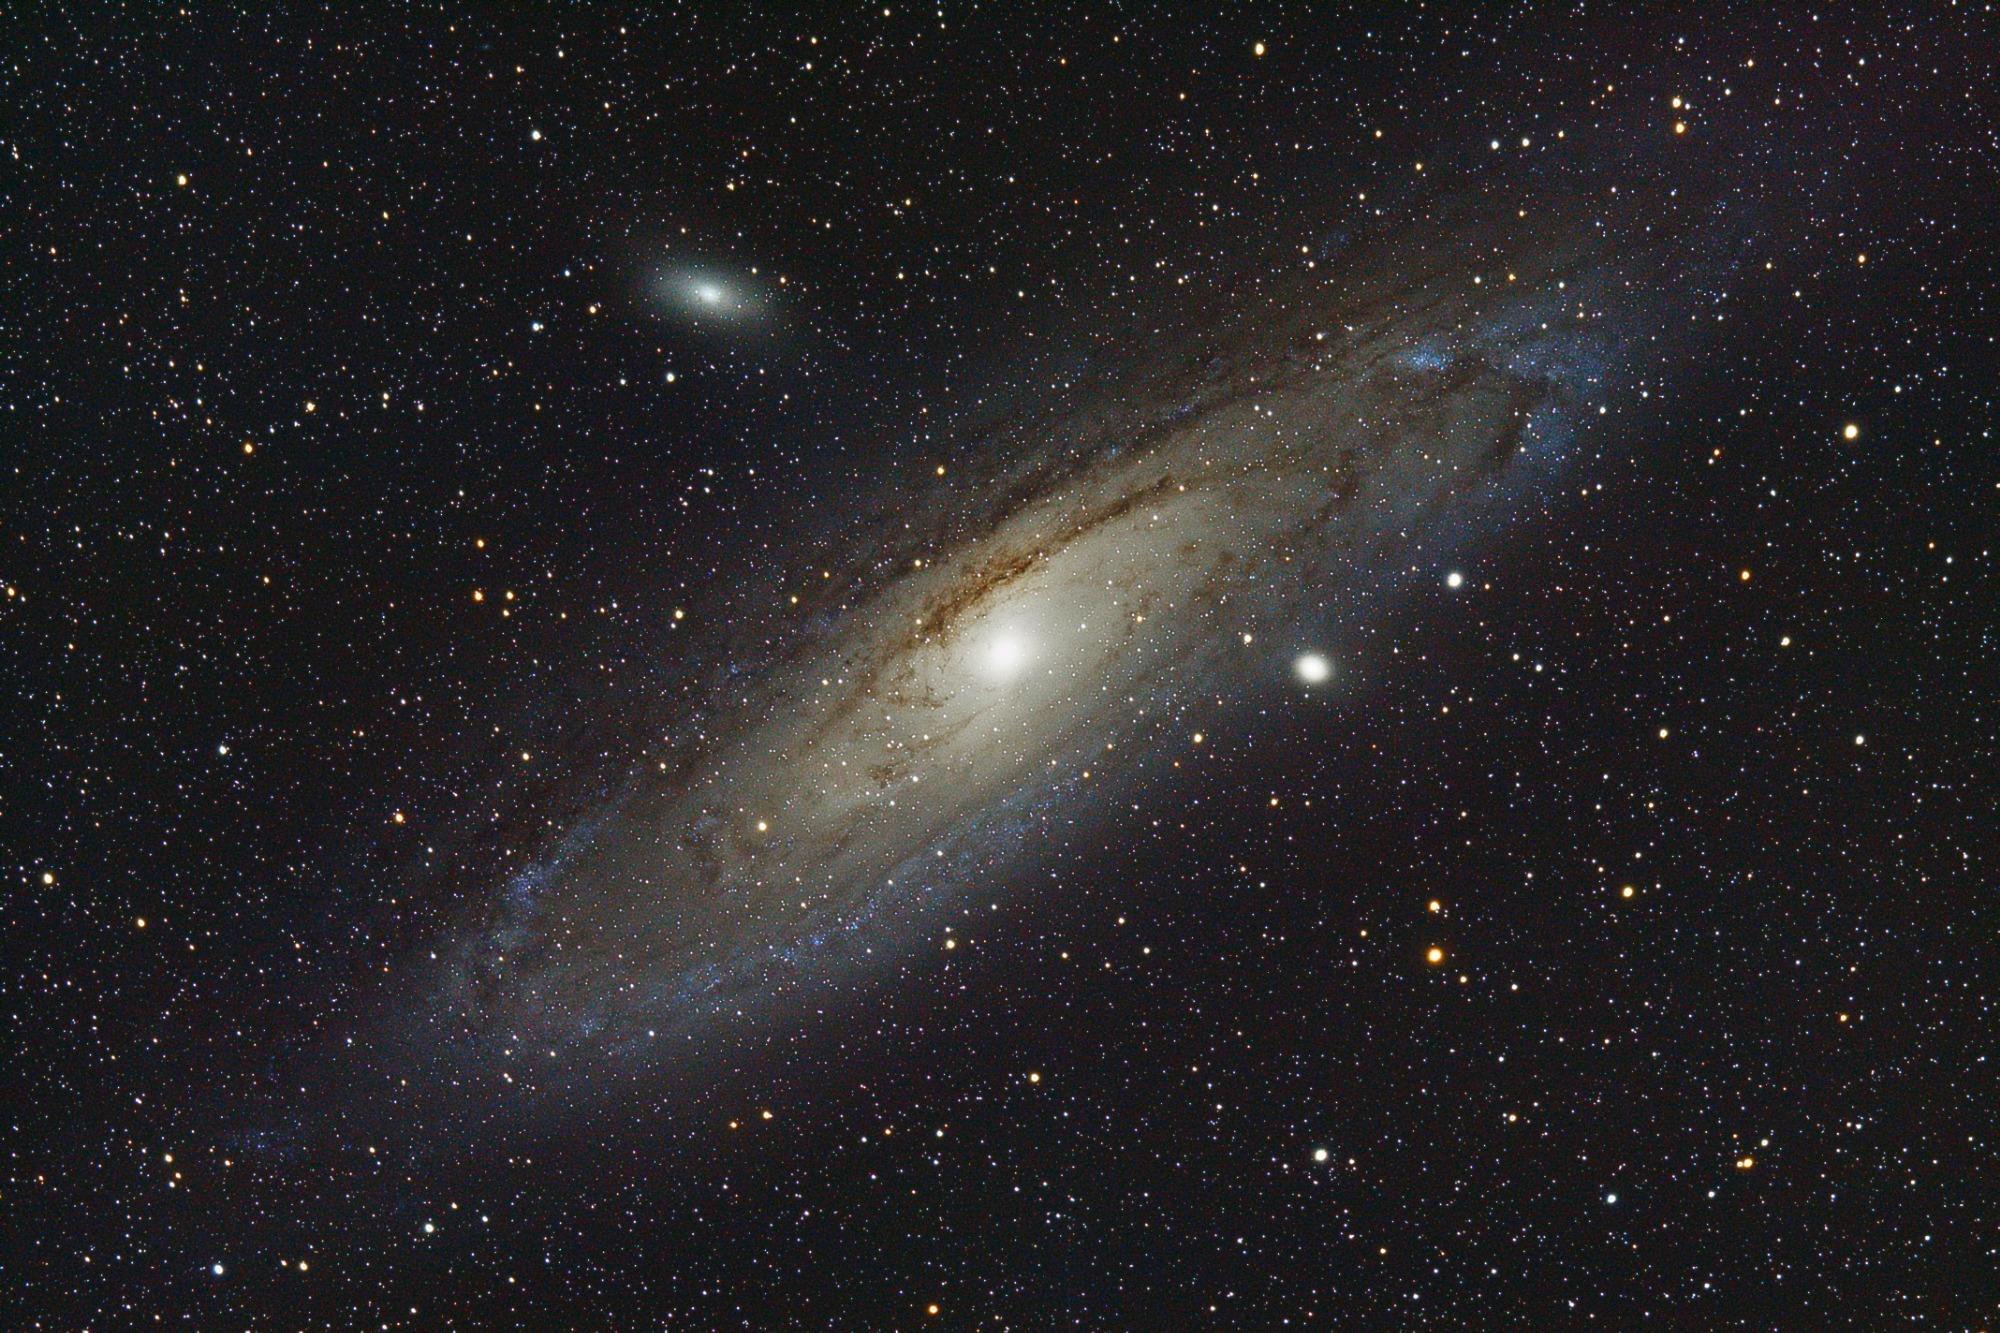 M31.jpg.2a60adb30232011646beb868224c0d5b.jpg